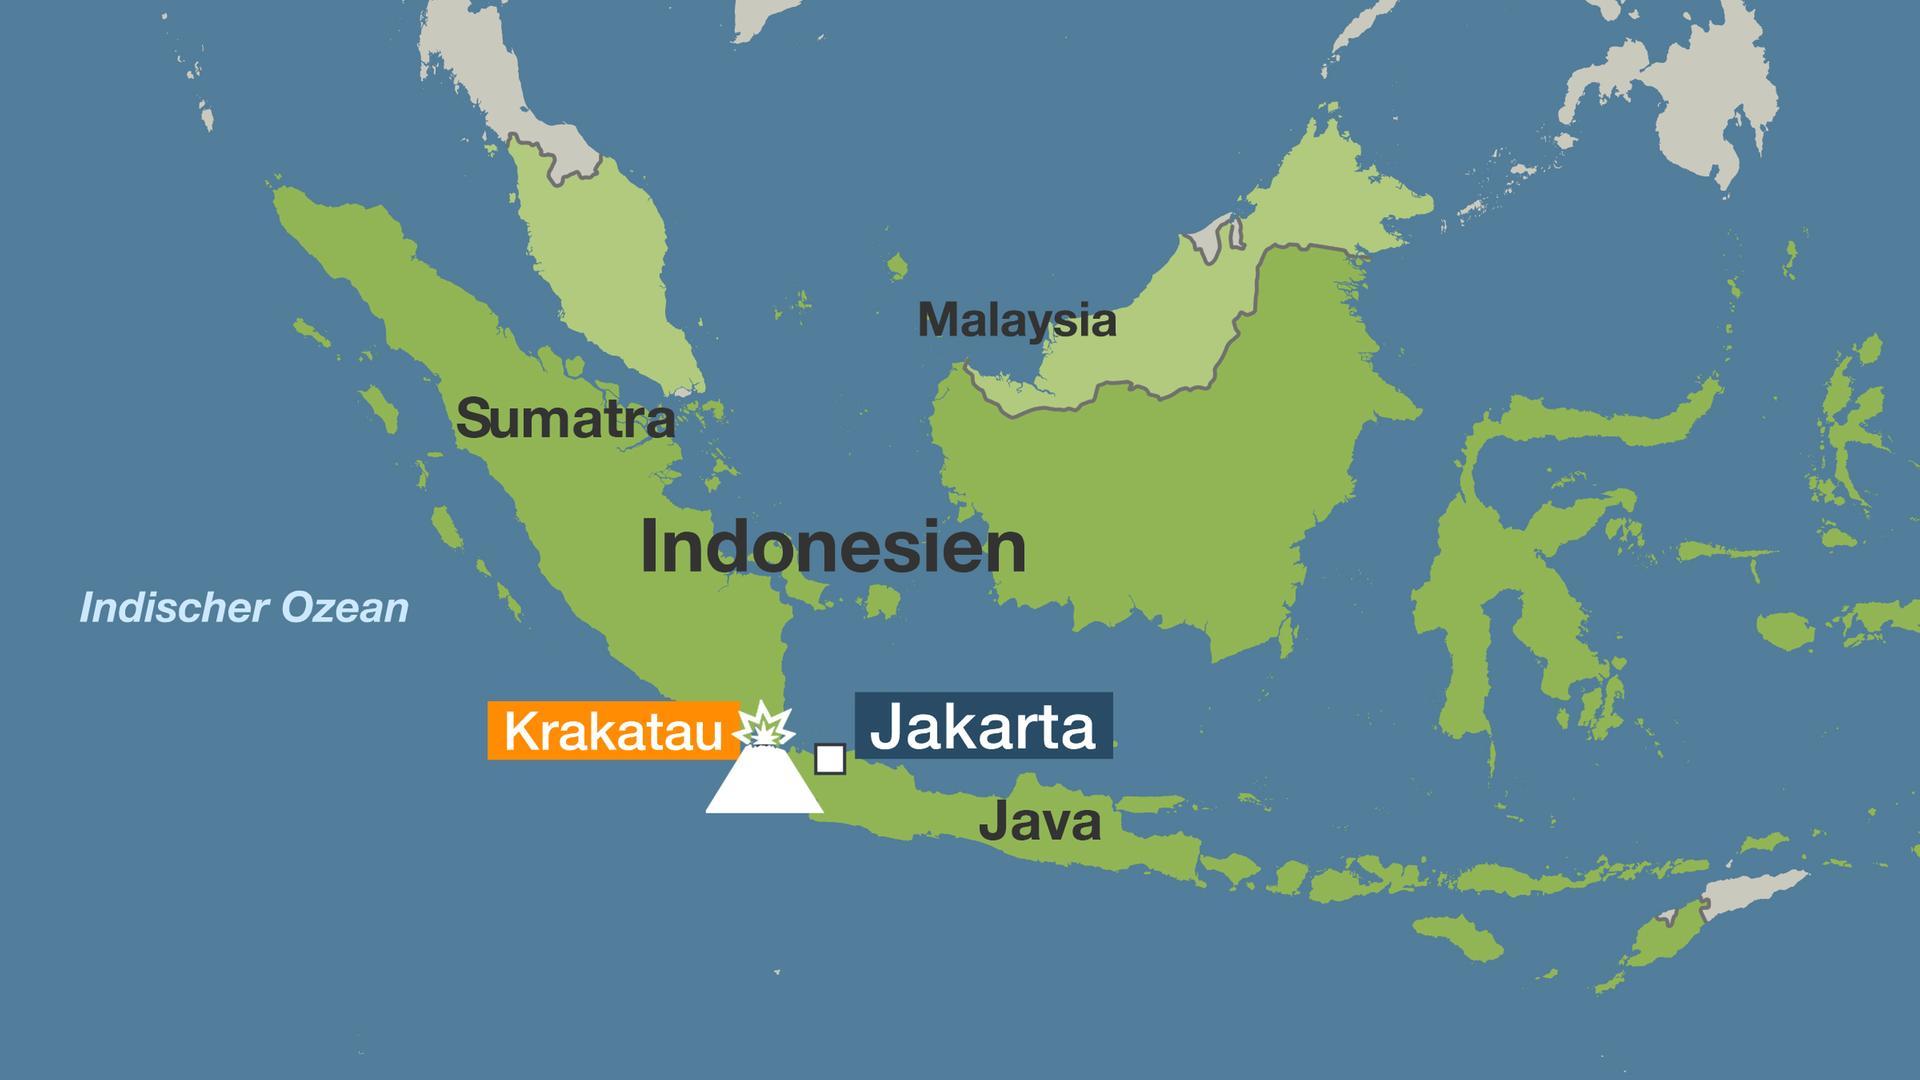 Vulkane Der Erde Karte.Erdbeben Und Vulkanausbrüche Indonesien Vulkanischer Hotspot Der